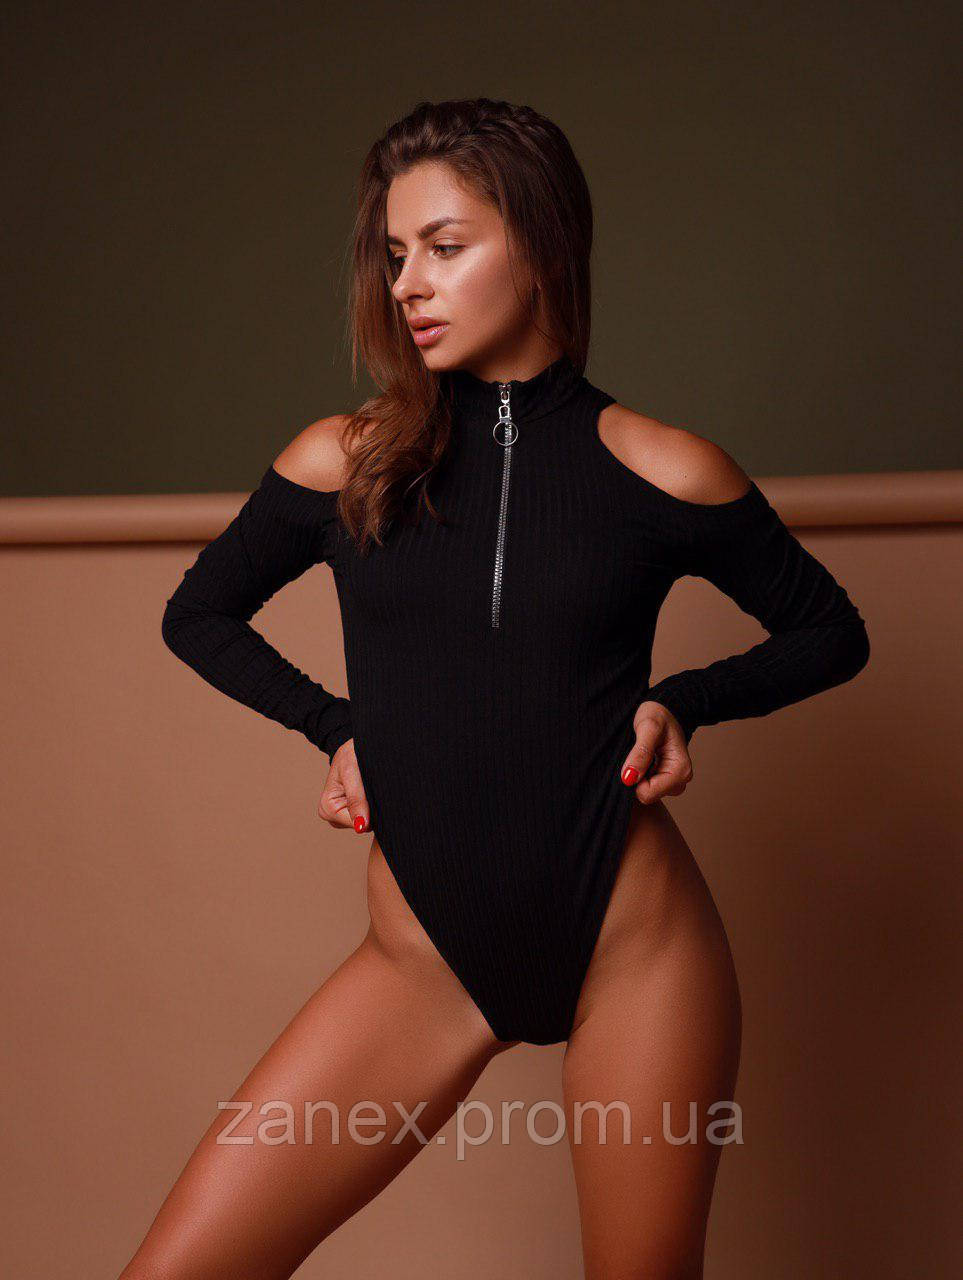 Женское боди черное Zanex «Бокс»